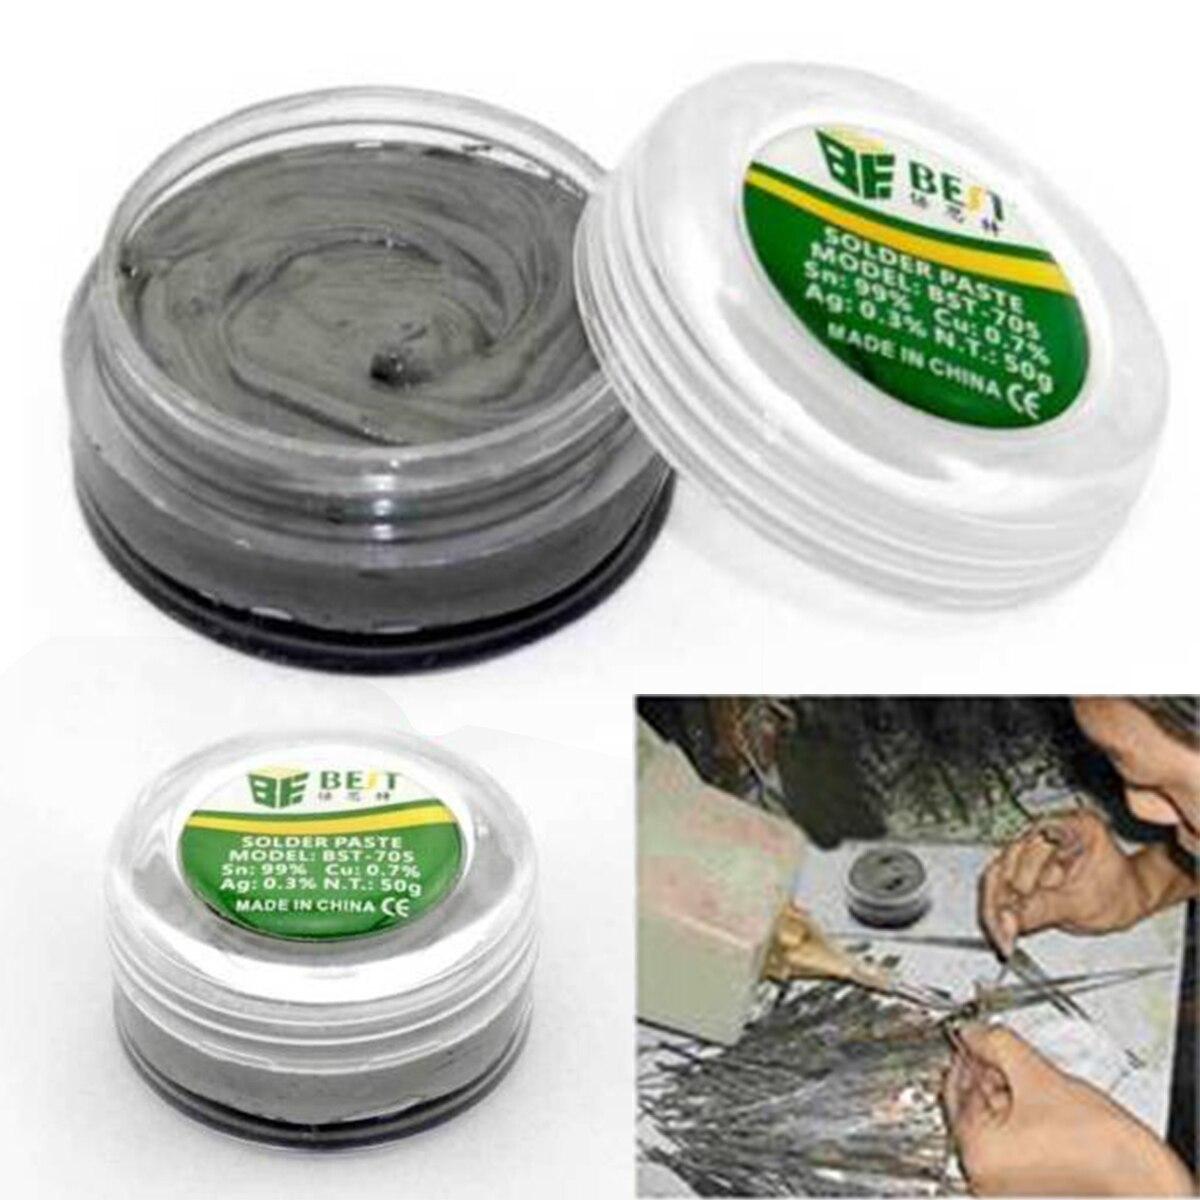 Strong Adhesive LeadFree Soldering Paste Solder Flux Paste Cream 50g for PCB BGA PGA SMD< Mobile Phones Maintenance Mayitr